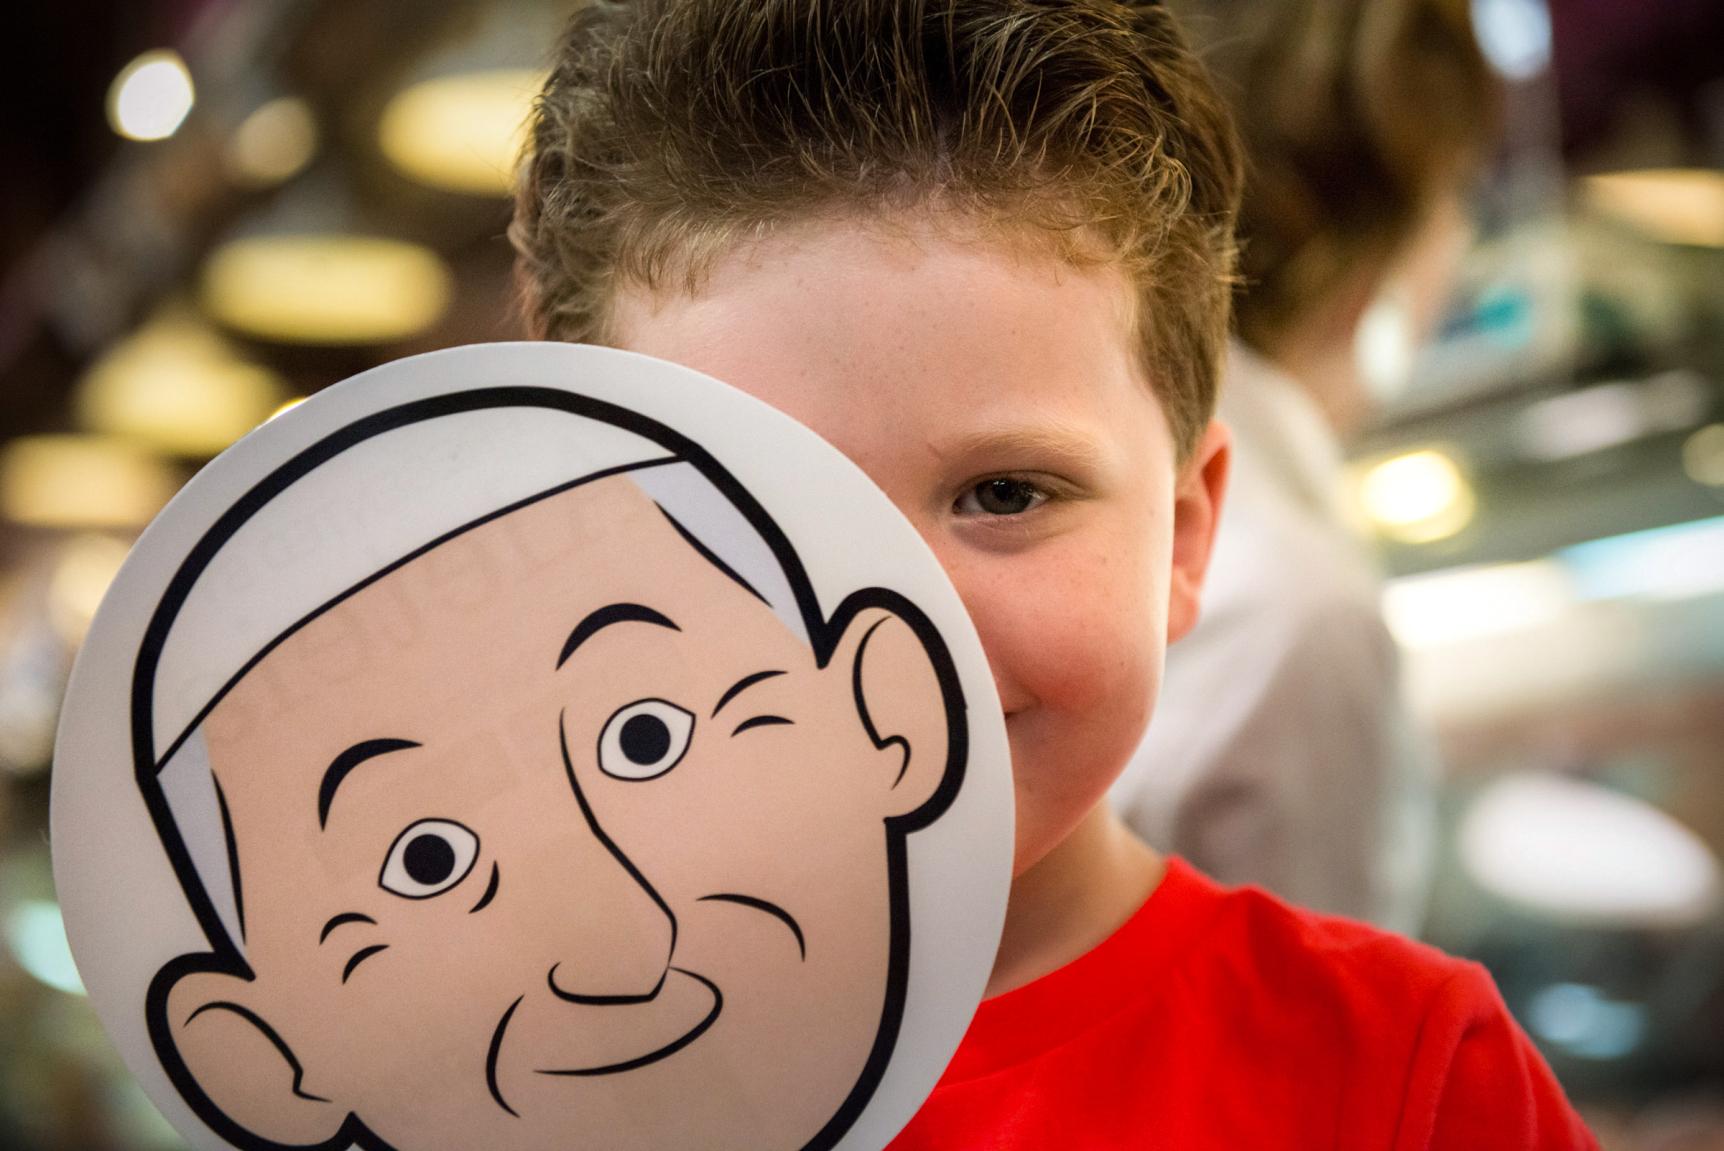 web-boy-face-popemoji-child-antoine-mekary